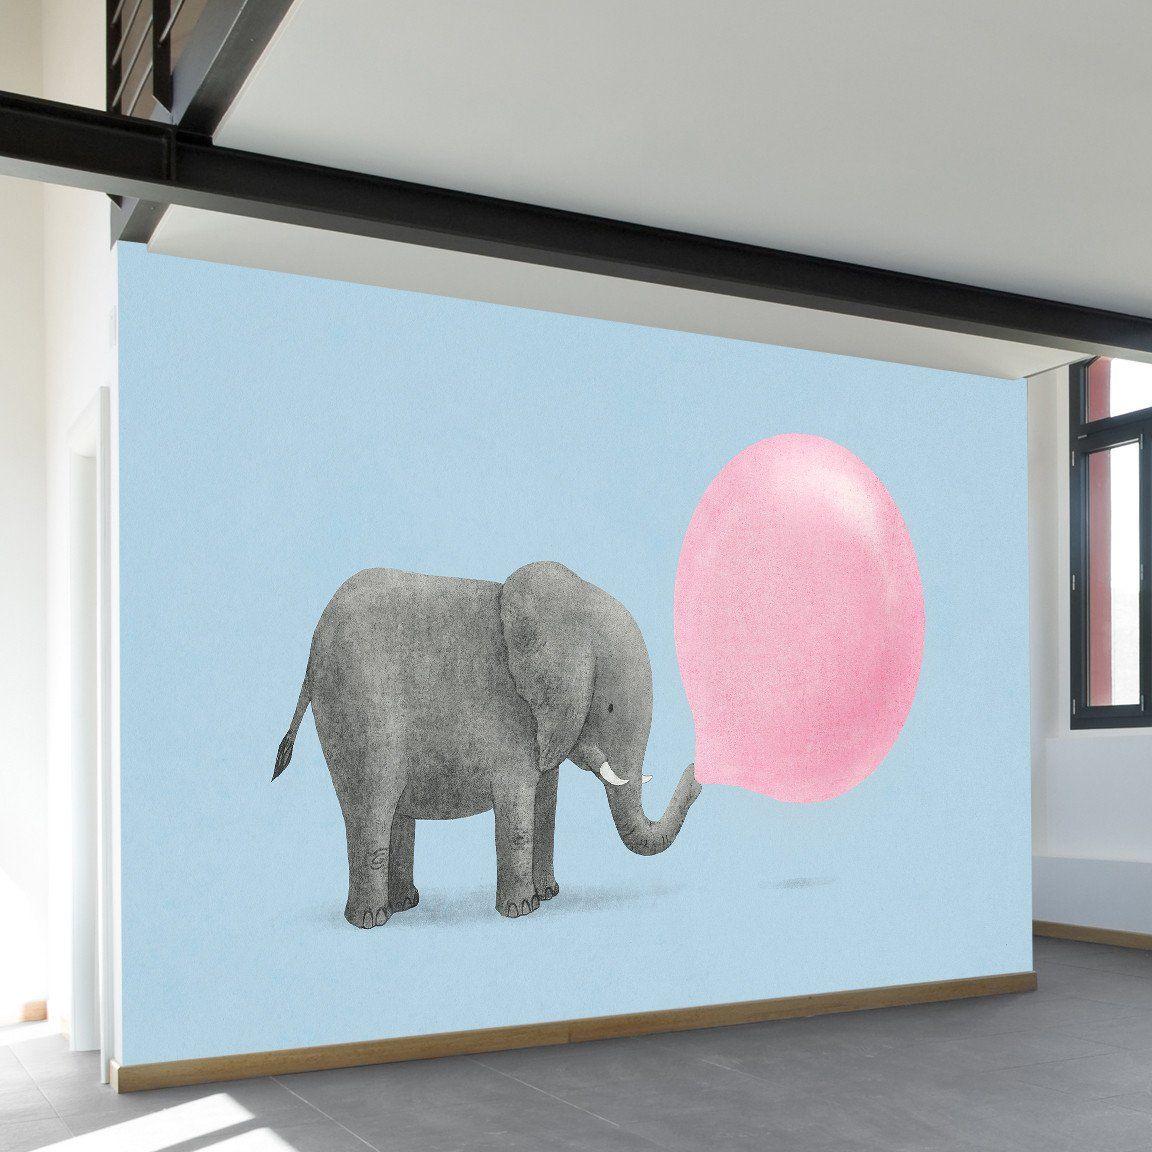 Jumbo Bubble Gum Wall Mural Wall murals Walls and Modern